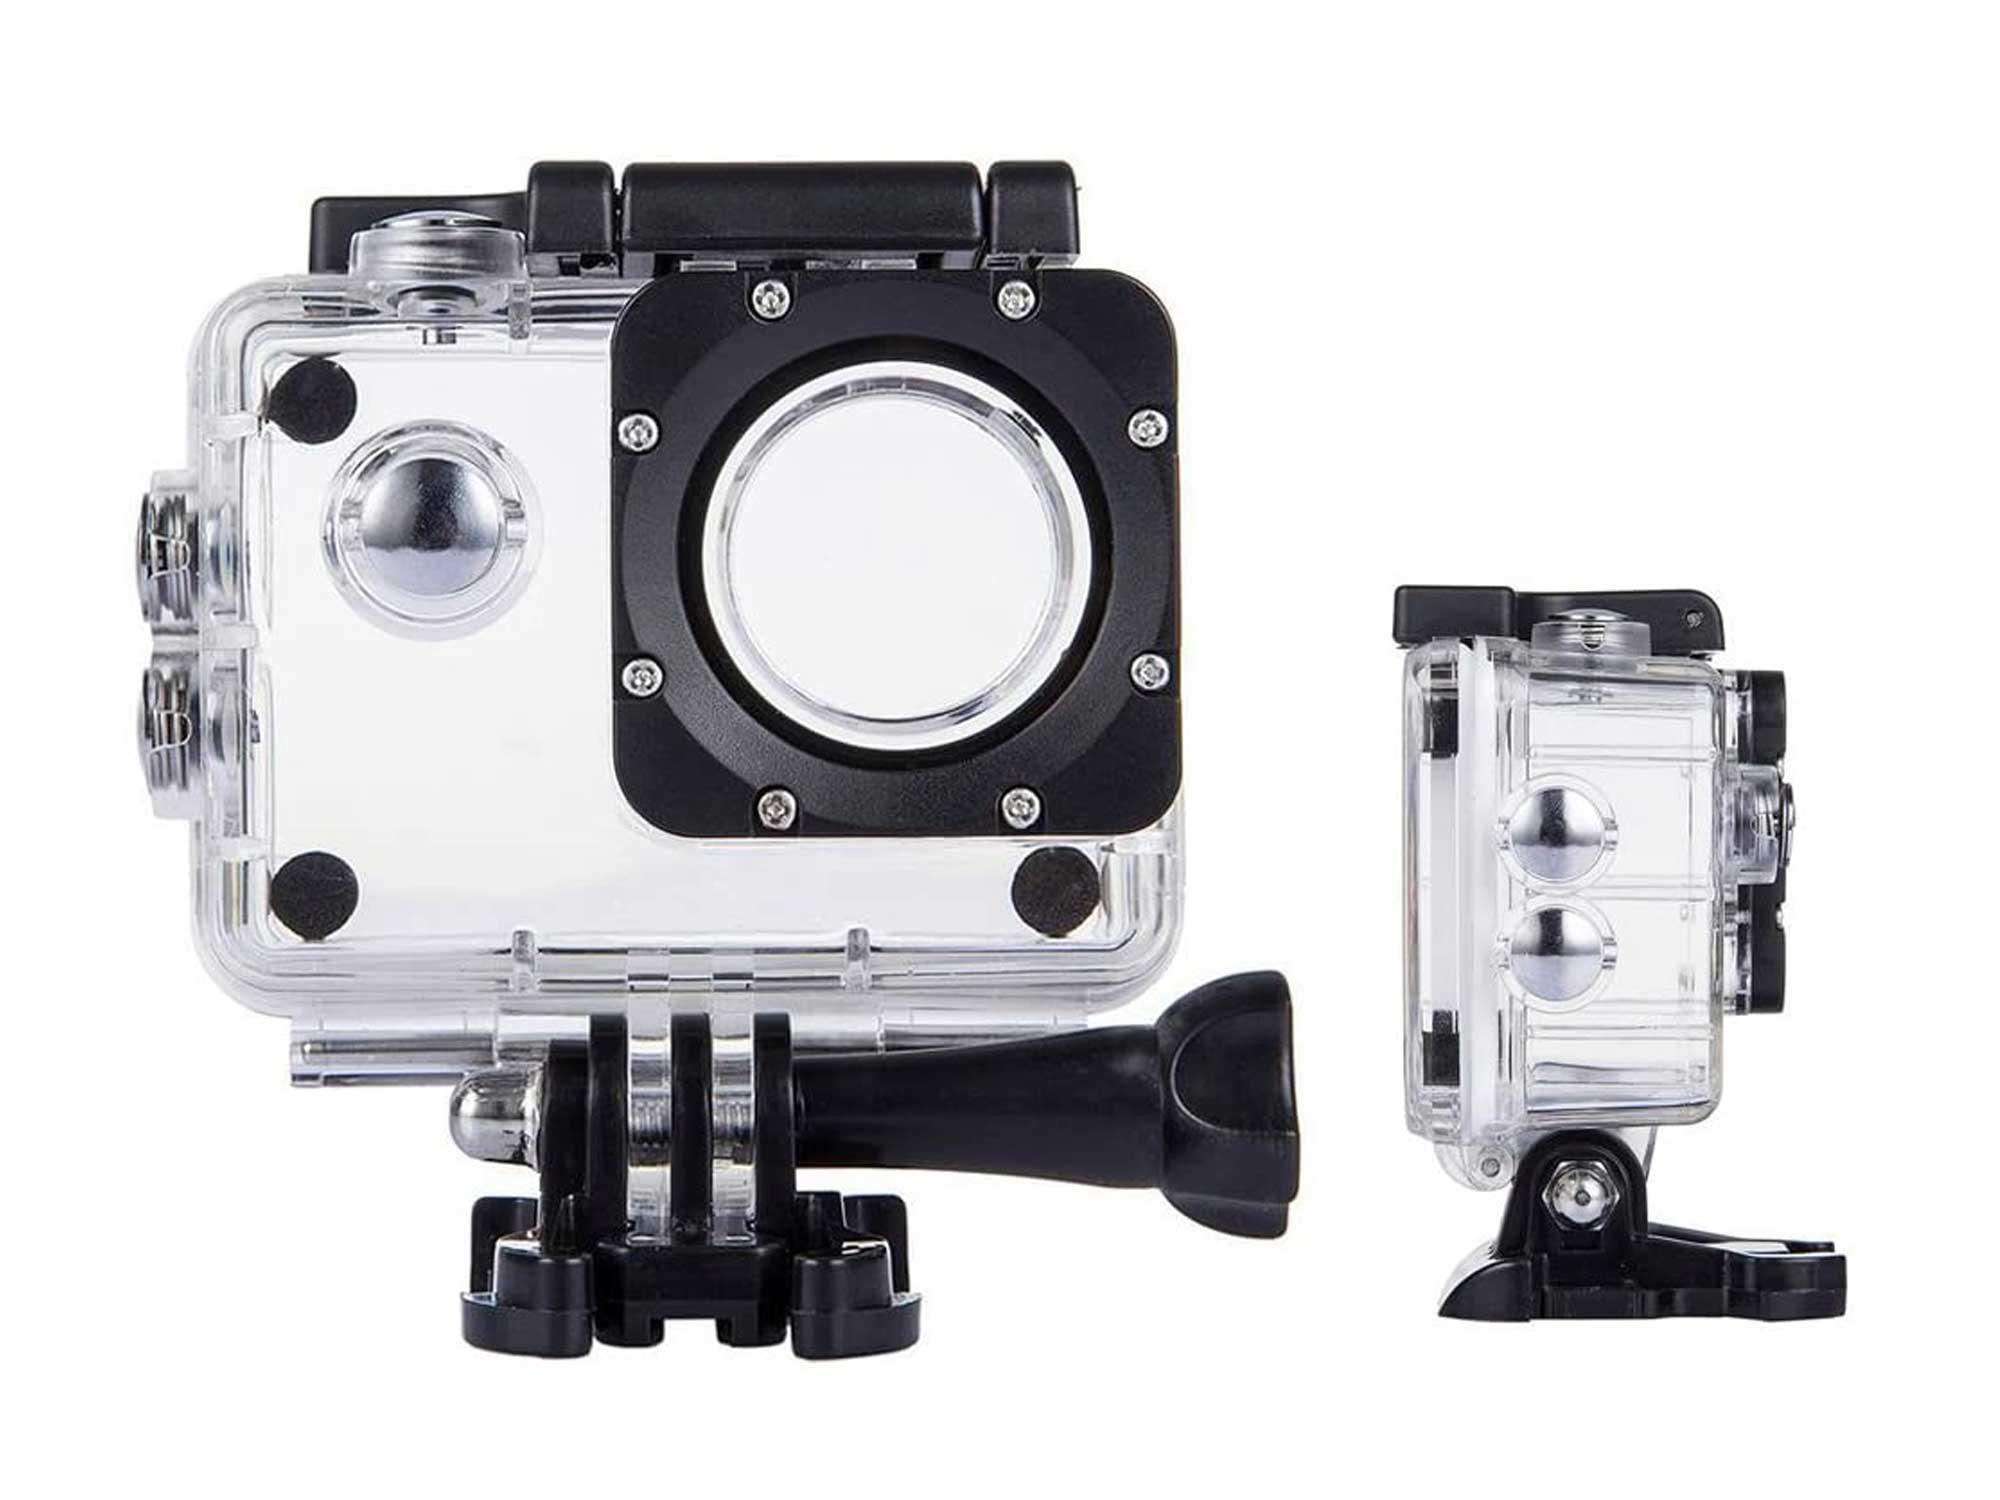 TEKCAM Action Camera Waterproof Case Underwater Protective Housing Case Compatible with AKASO EK5000/ DBPOWER EX5000/ WiMiUS Q1Q2/ EKEN H9R/ Campark X15 V30 Sports Camera